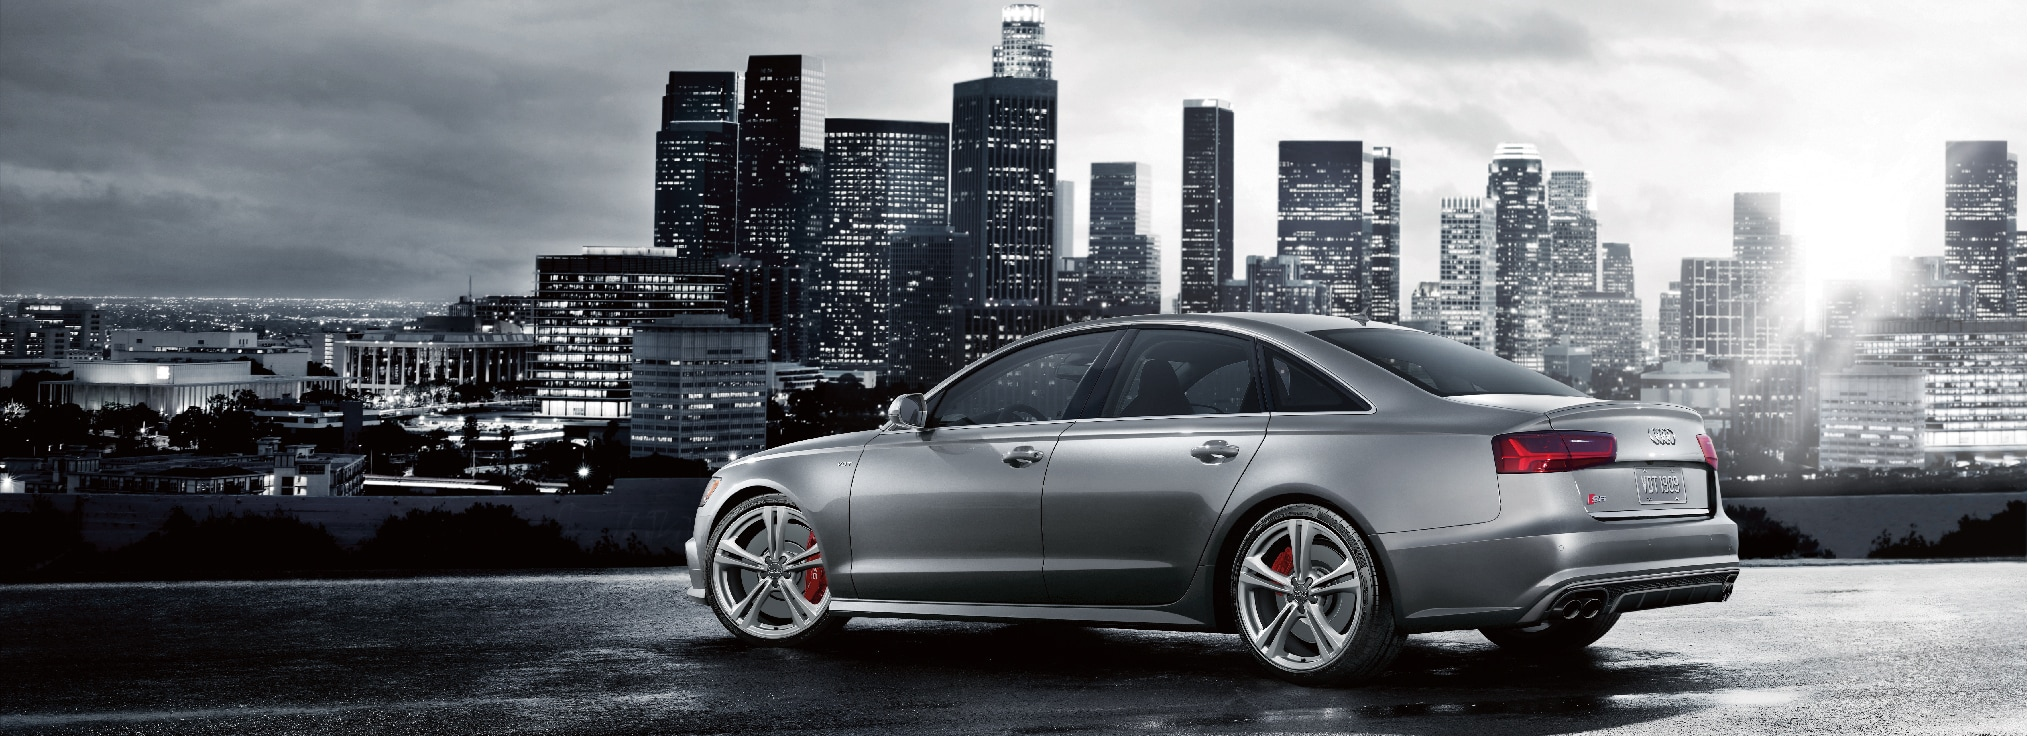 Audi Loyalty Pull-Ahead Program | Audi North Austin